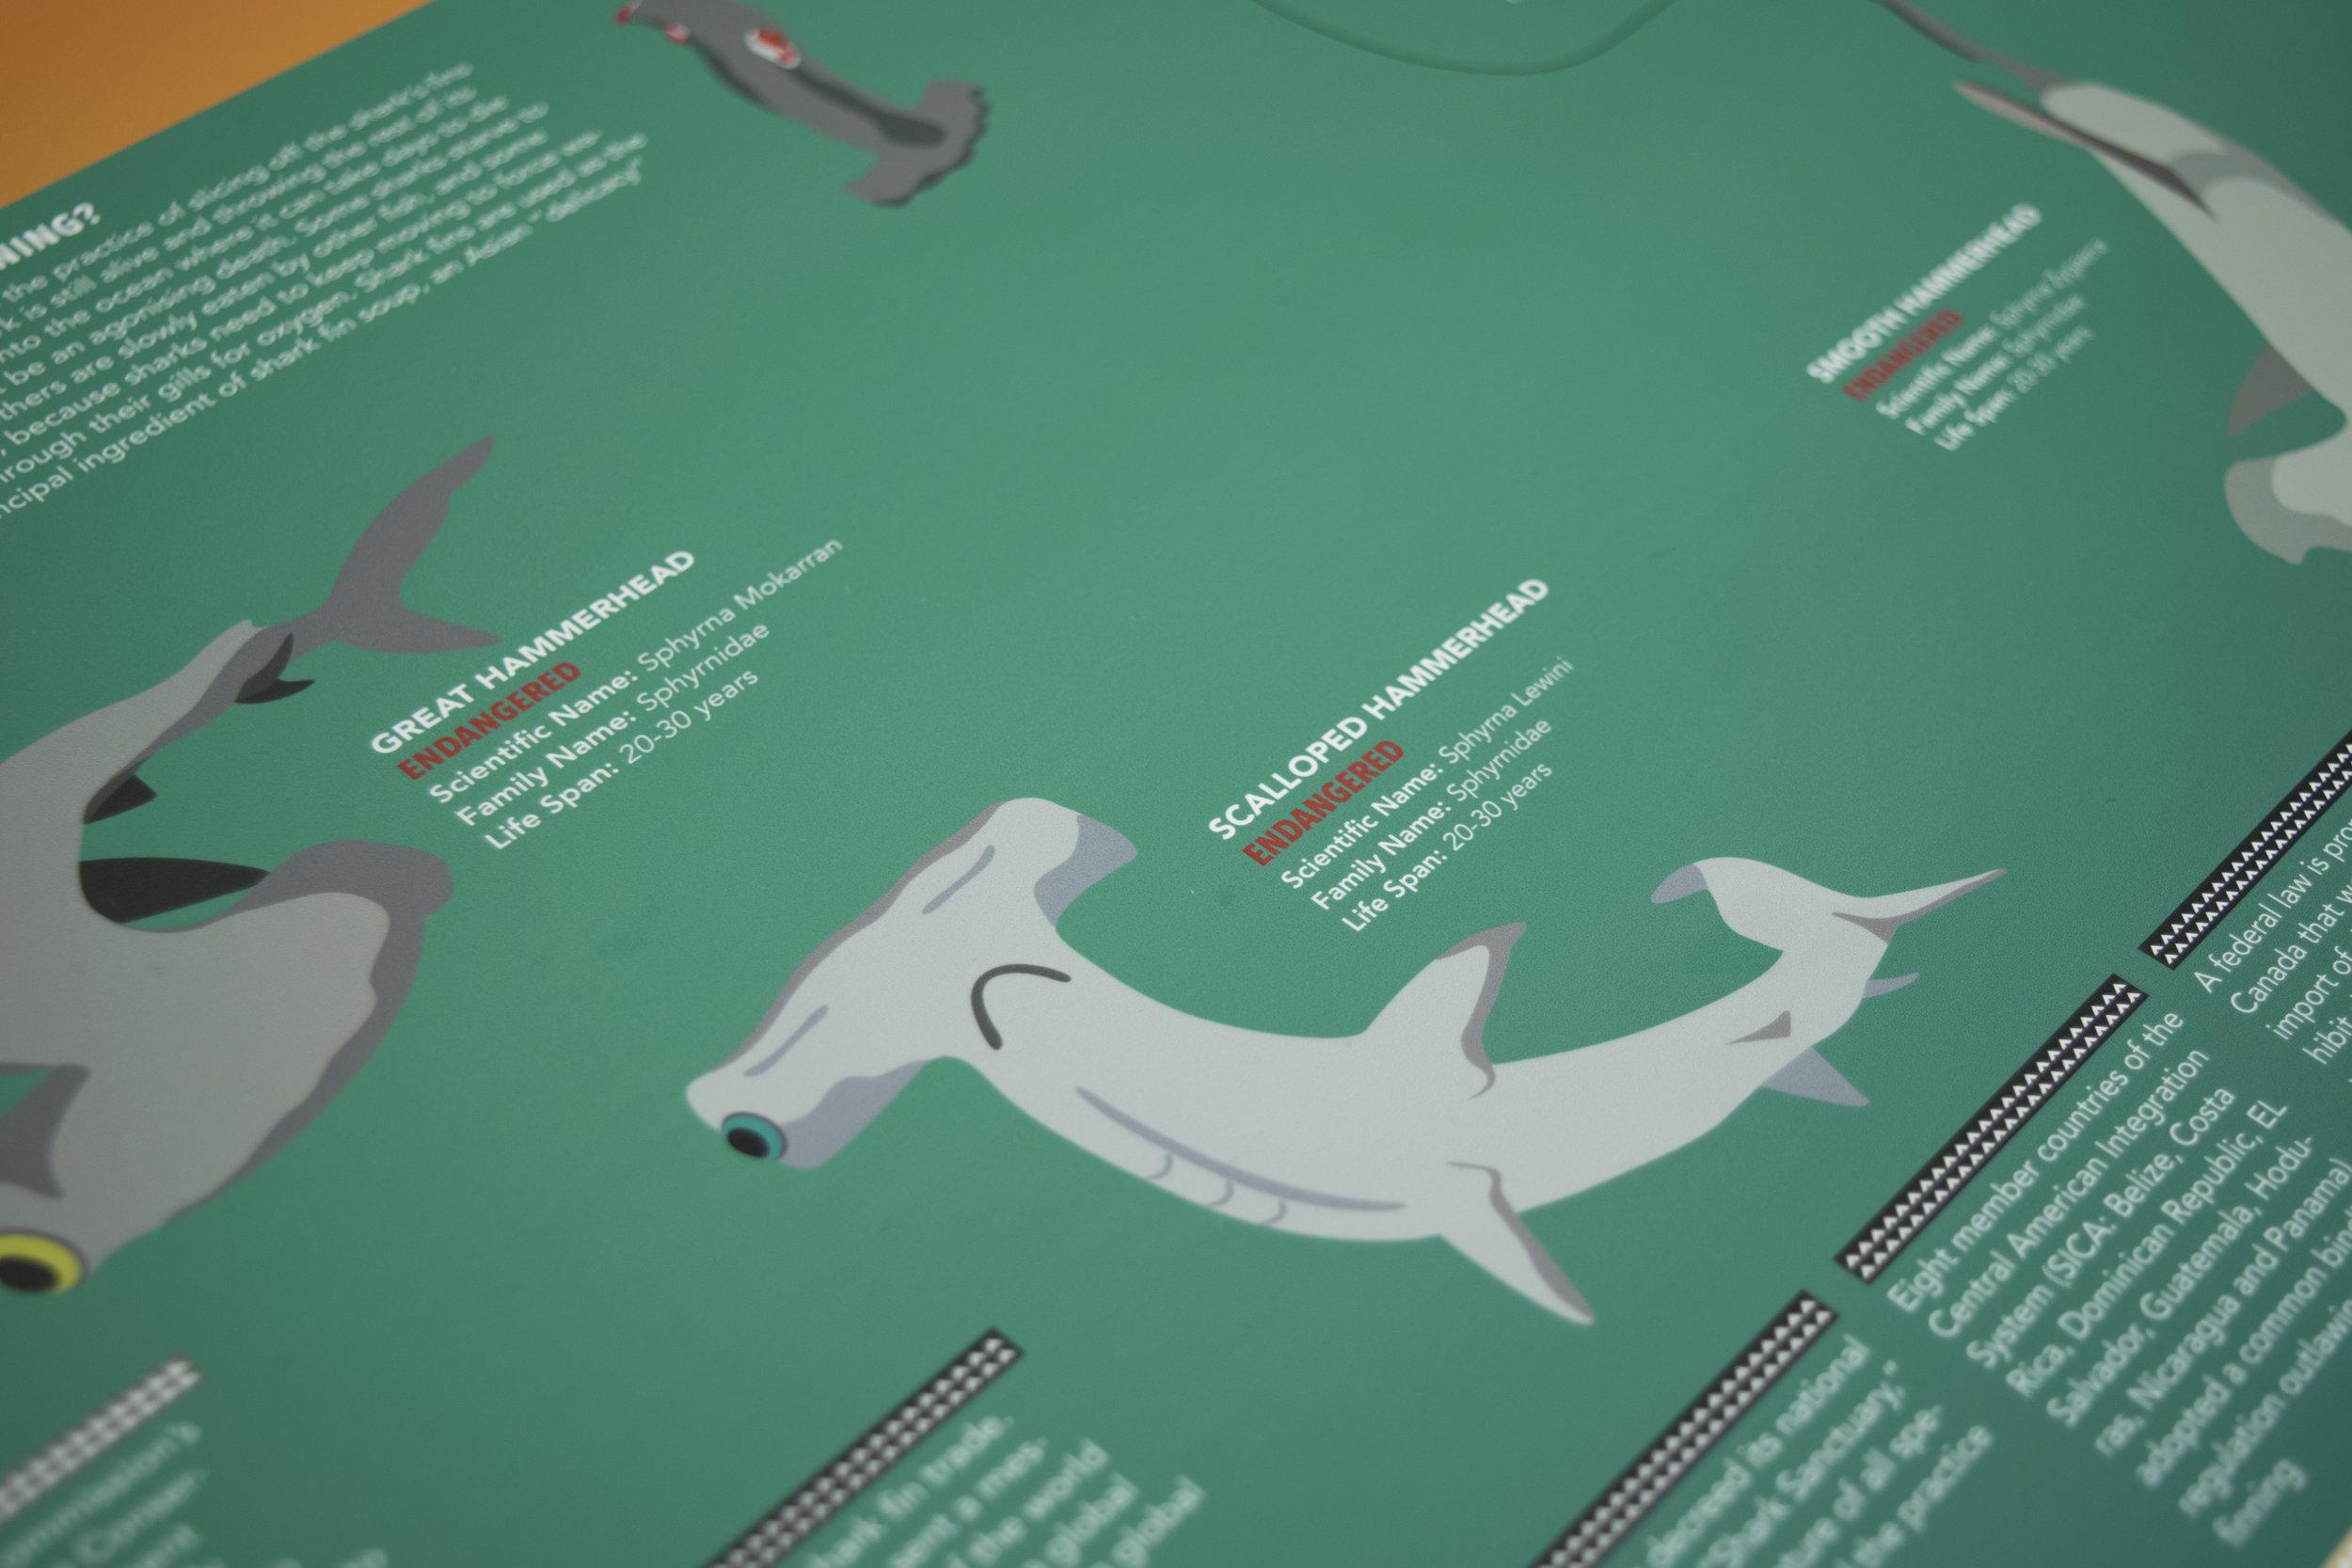 hammerhead shark2.jpg